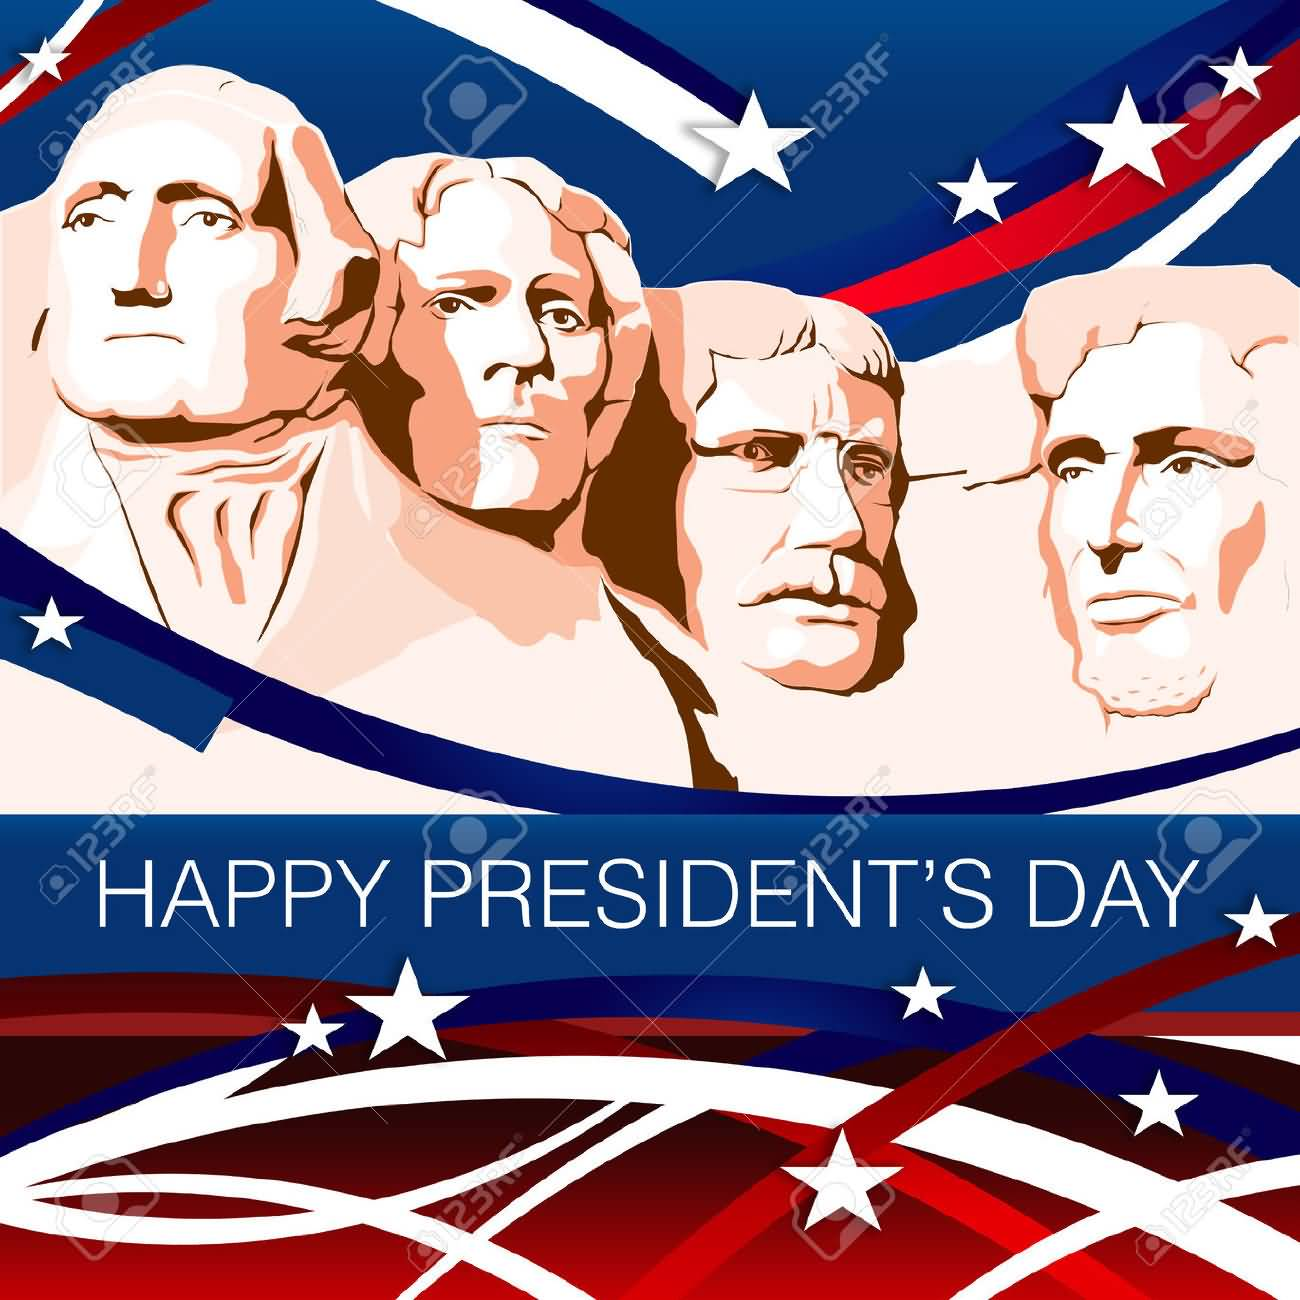 Happy Presidents Day Mount Rushmore Illustration